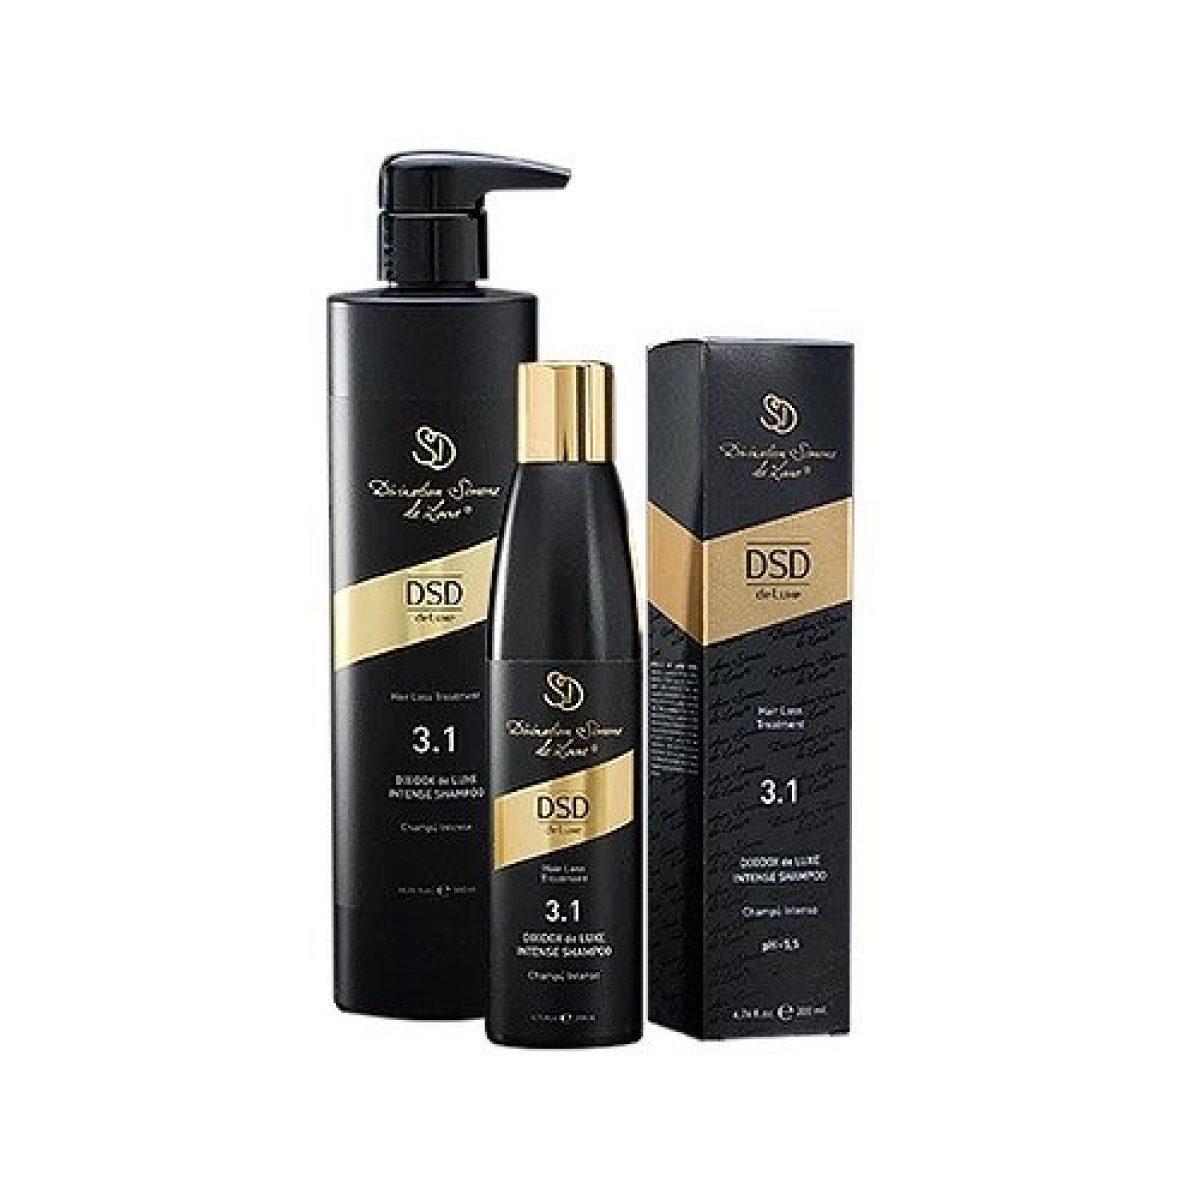 DSD De Luxe 3.1 Dixidox de Luxe intense shampoo